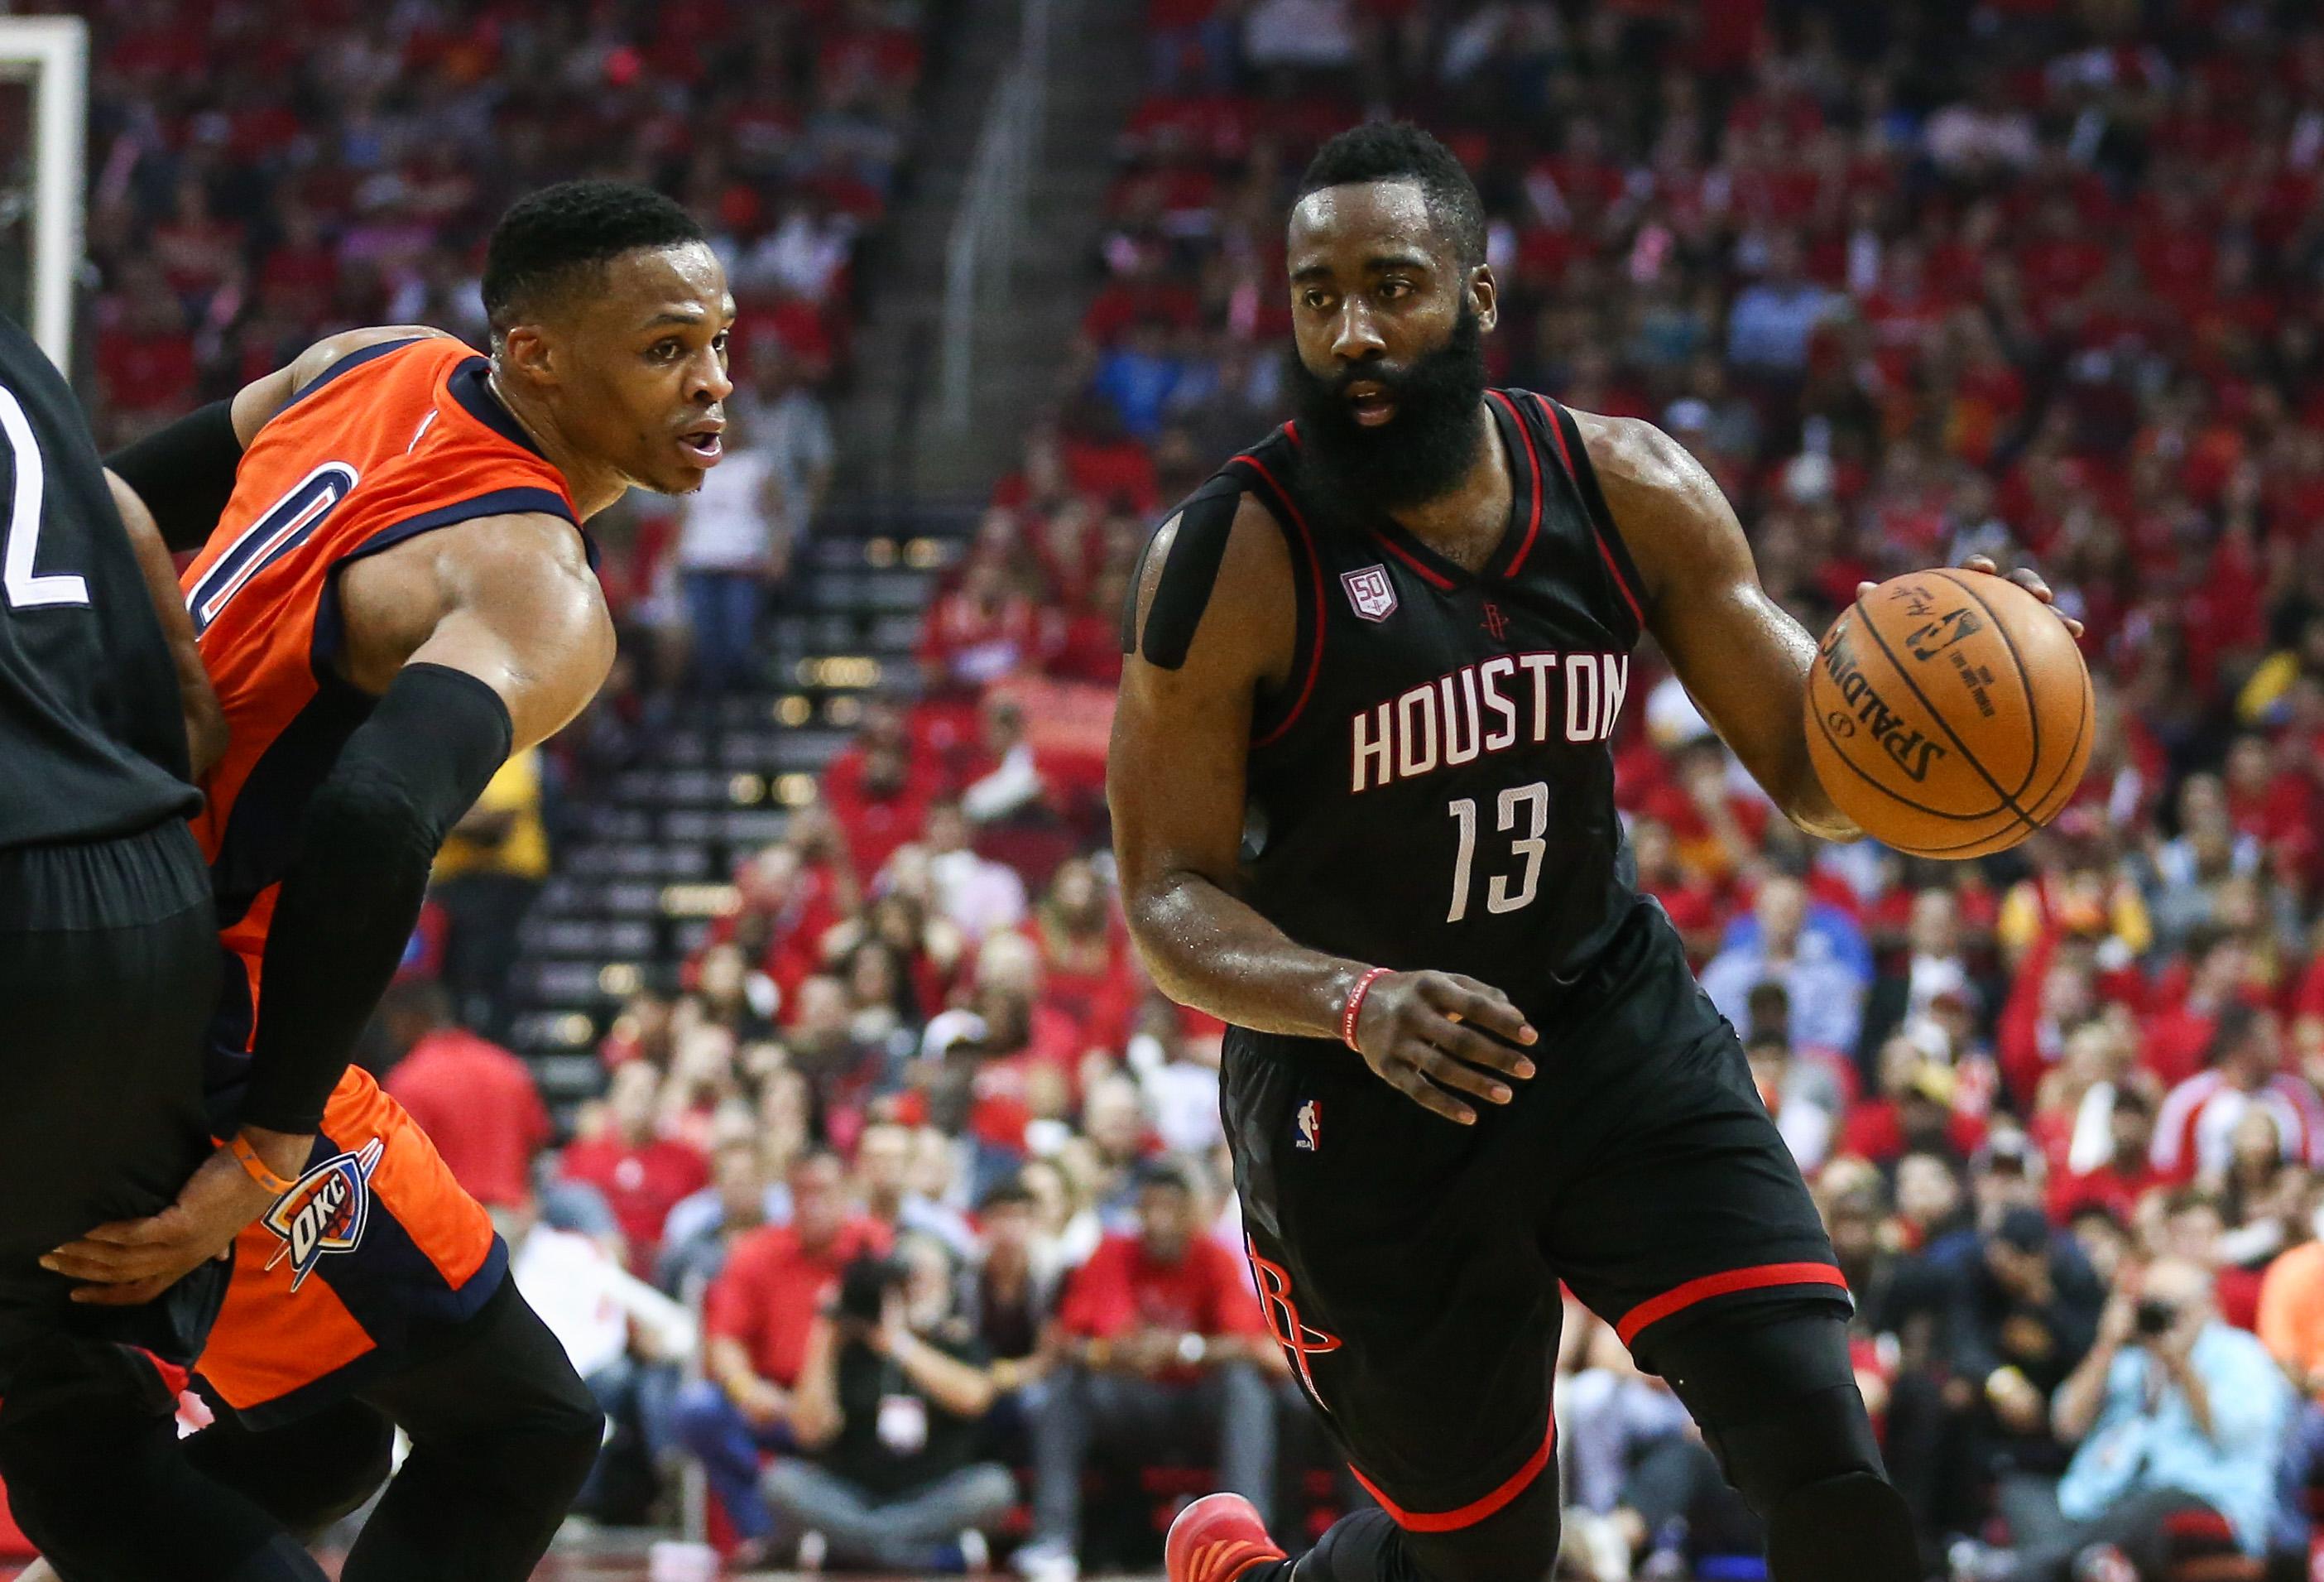 Houston Rockets: James Harden Did Not Win the MVP